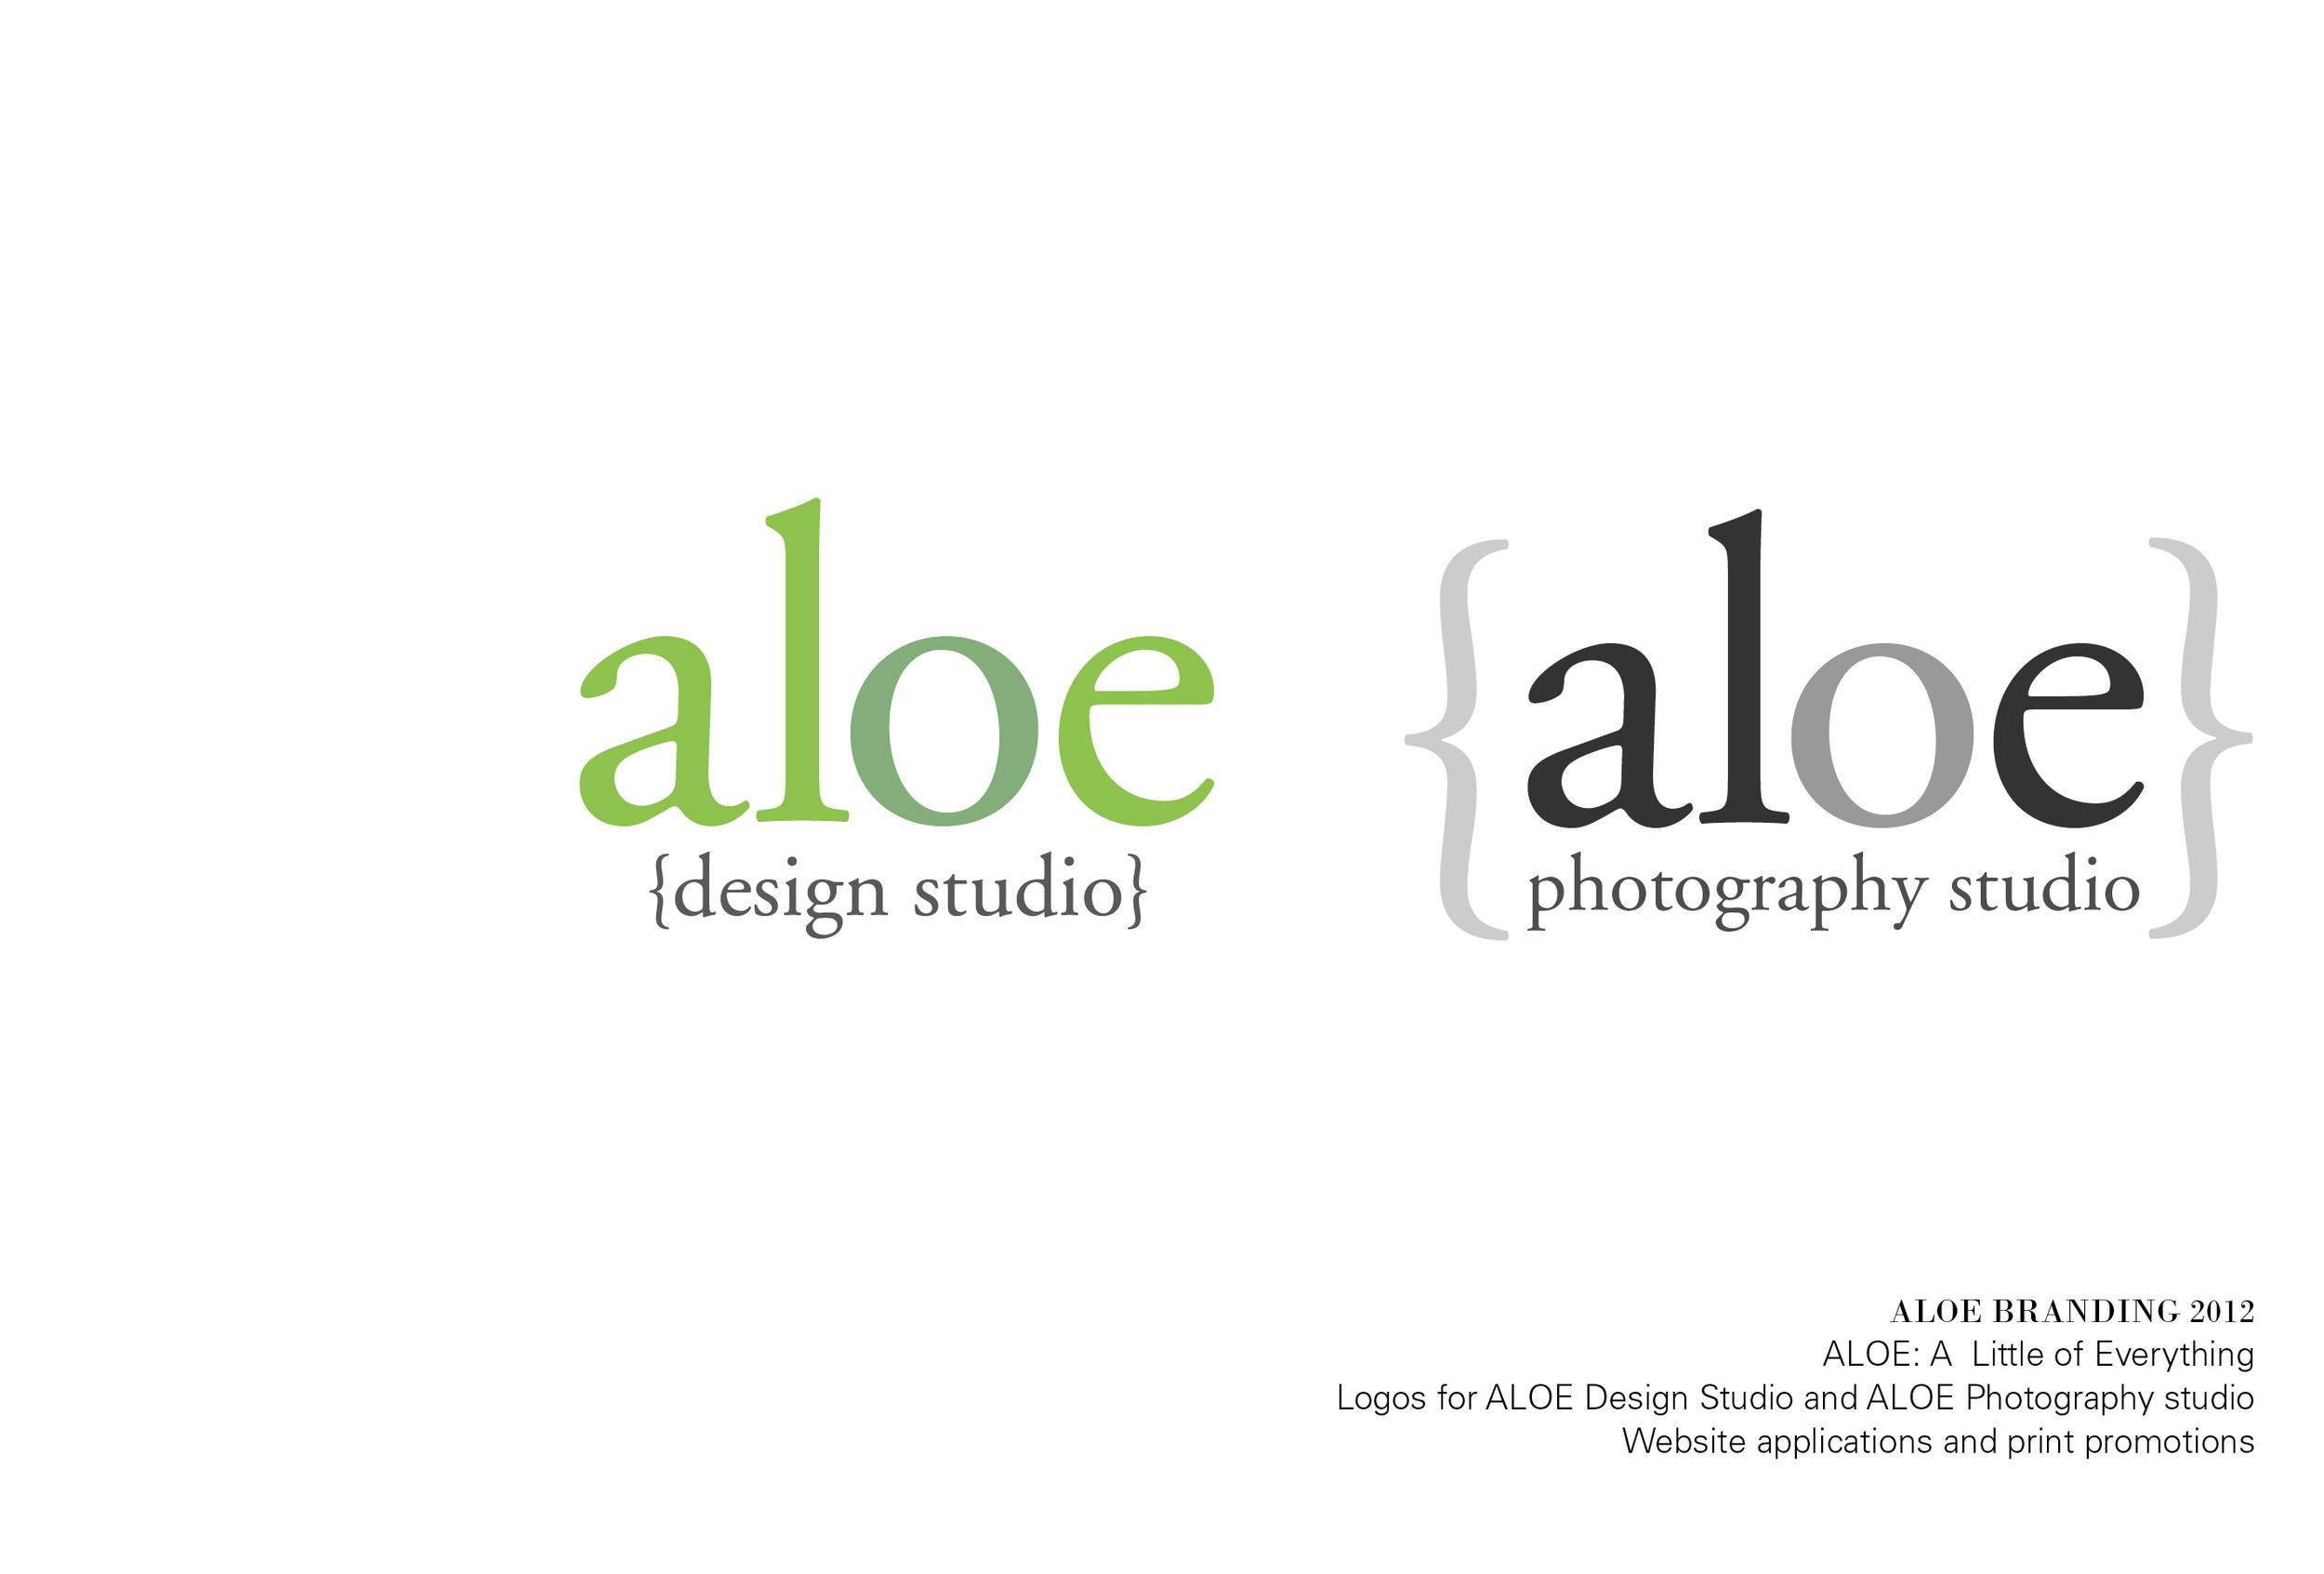 Botts_Art_Design_Portfolio7.jpg